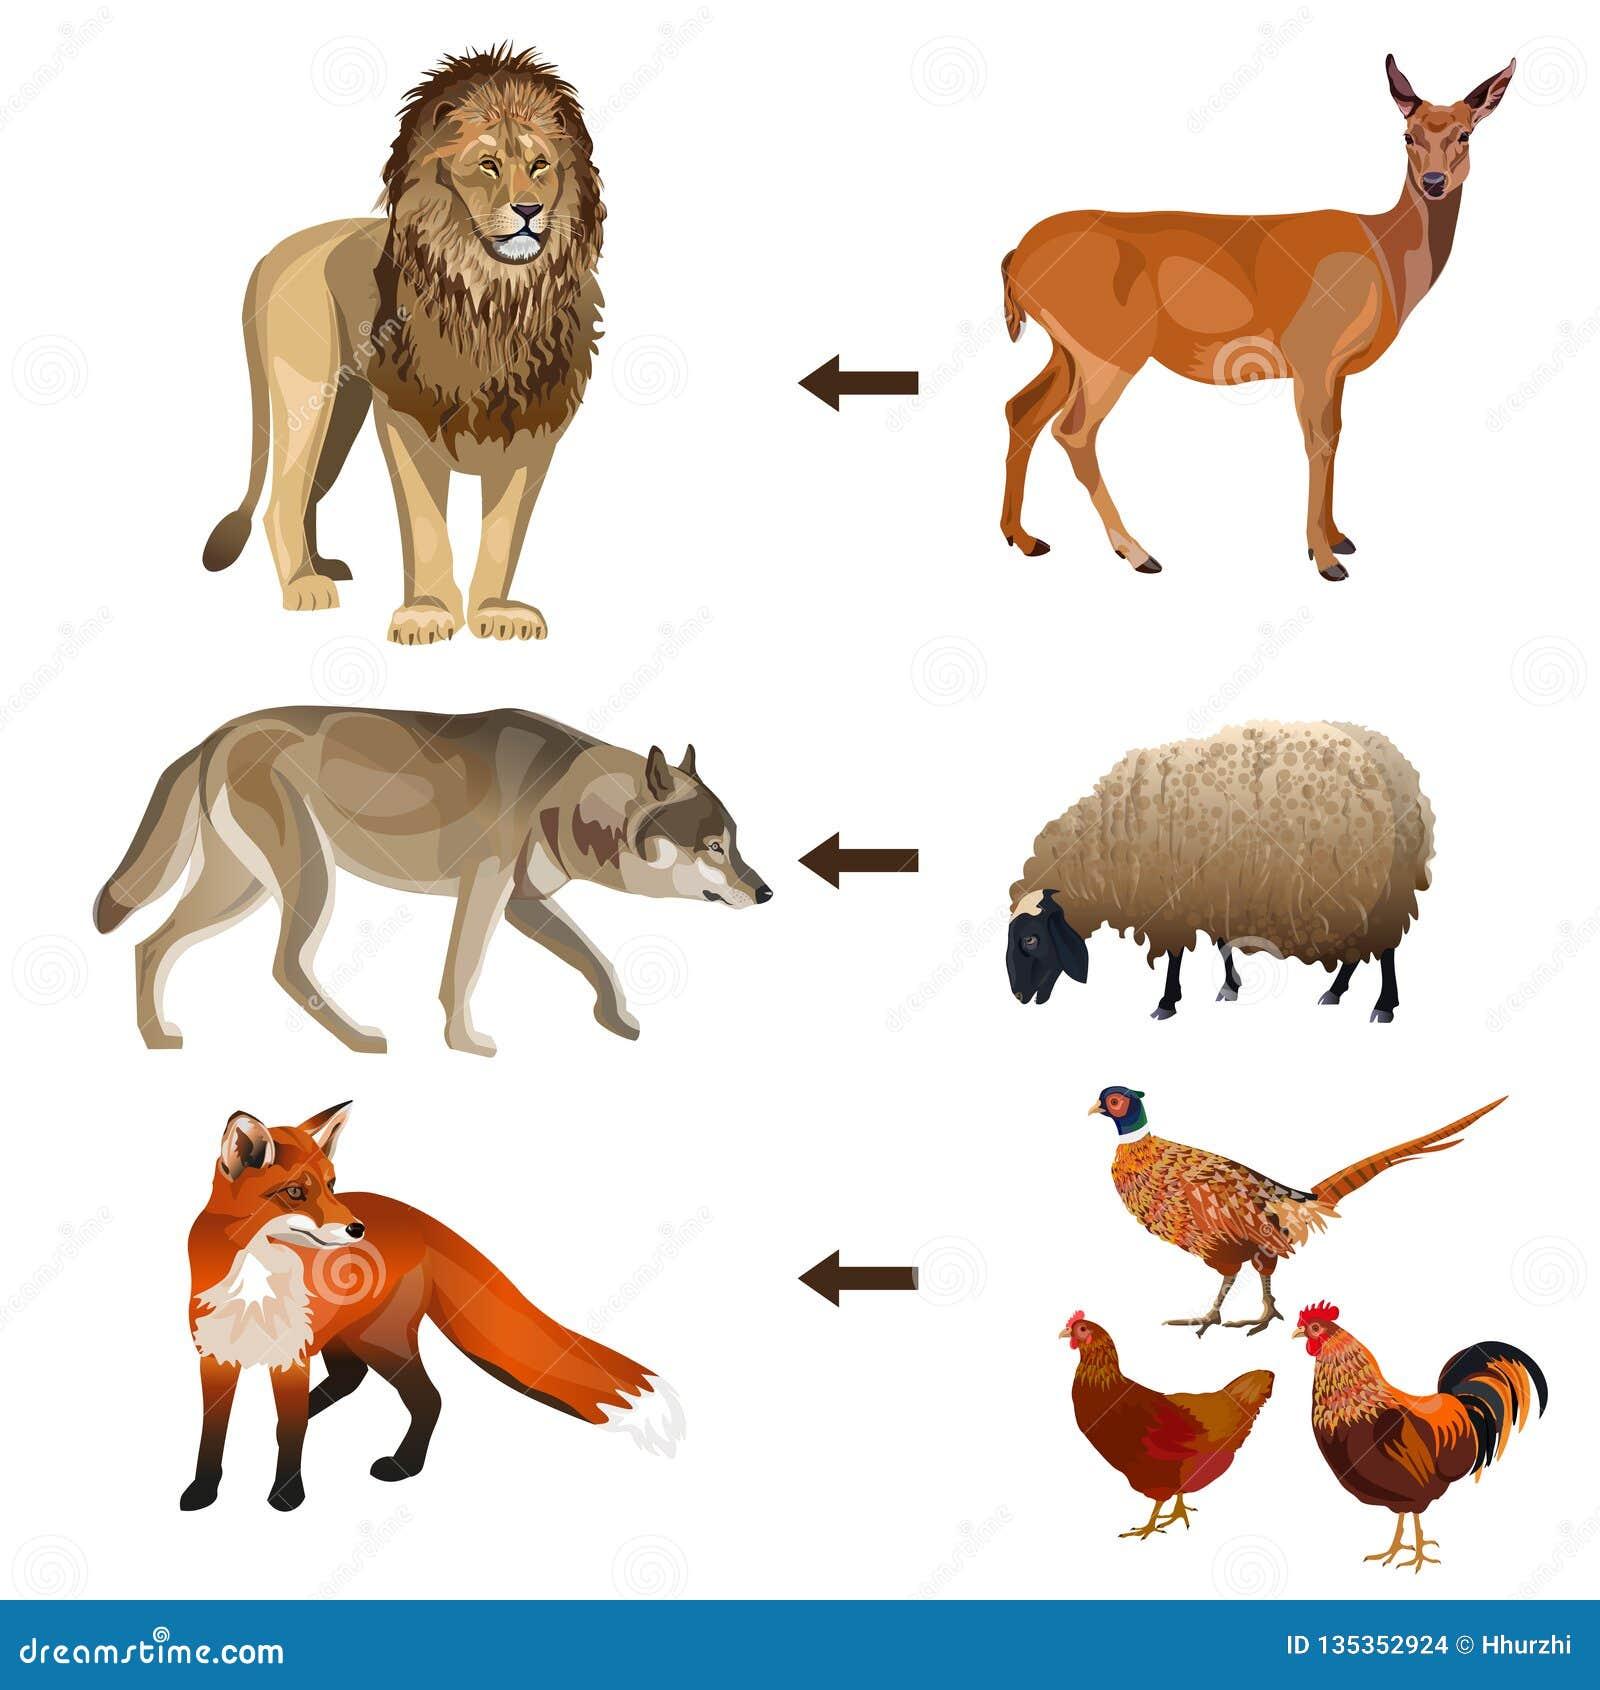 Food chain animals